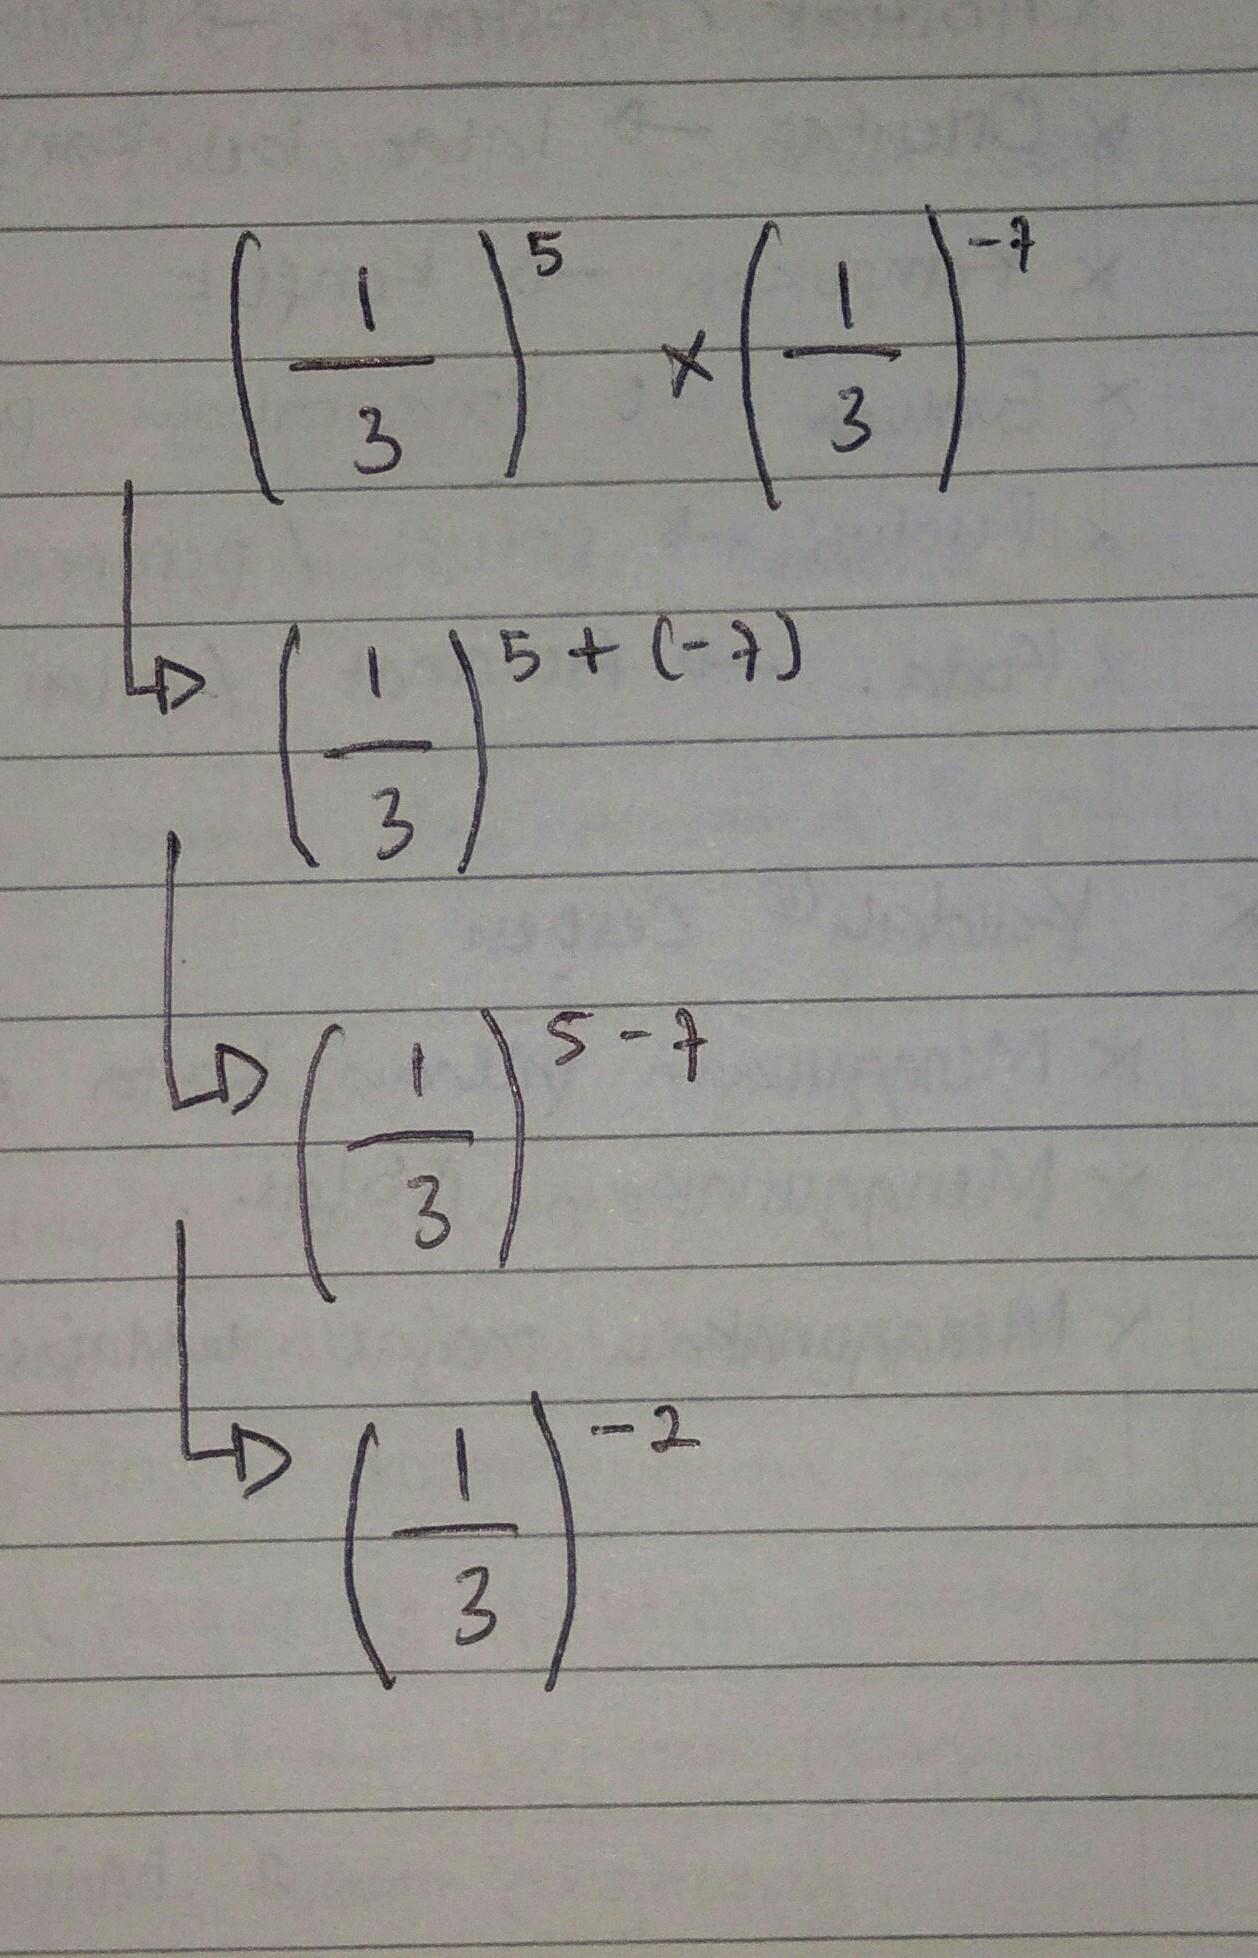 1 3 5 1 3 7 Tolong Bantu Jawab Yadengan Cara Nya Brainly Co Id